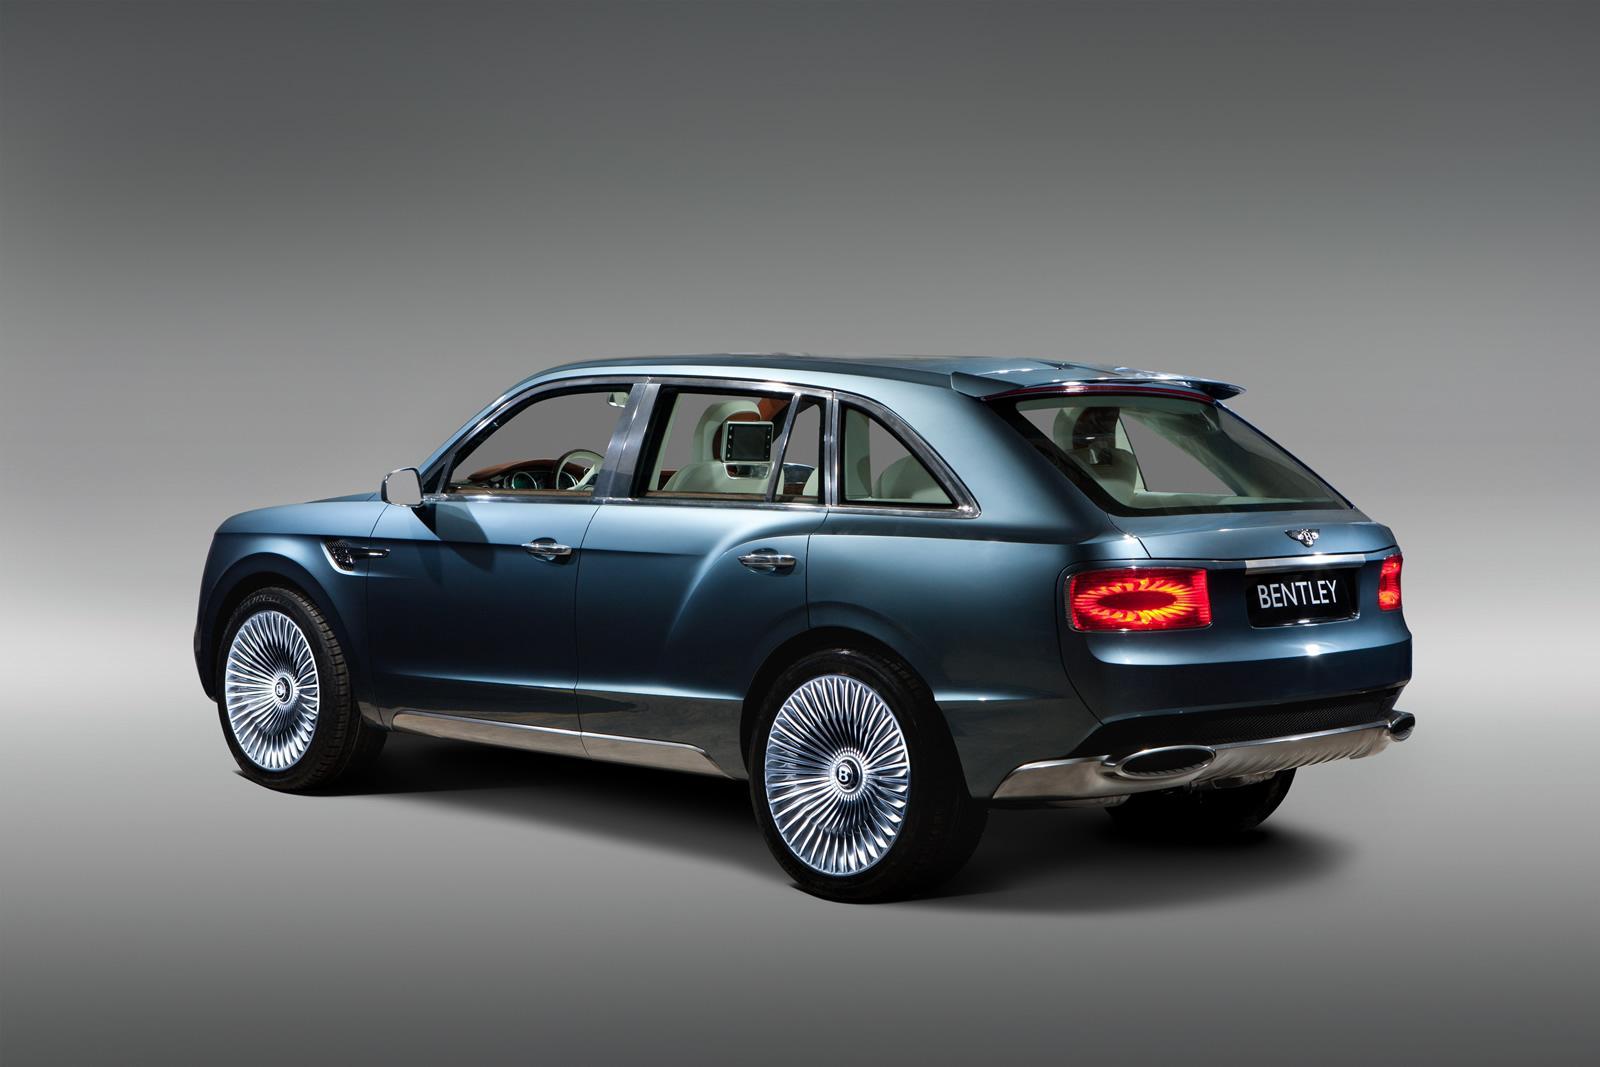 Bentley Cars 44 Widescreen Car Wallpaper